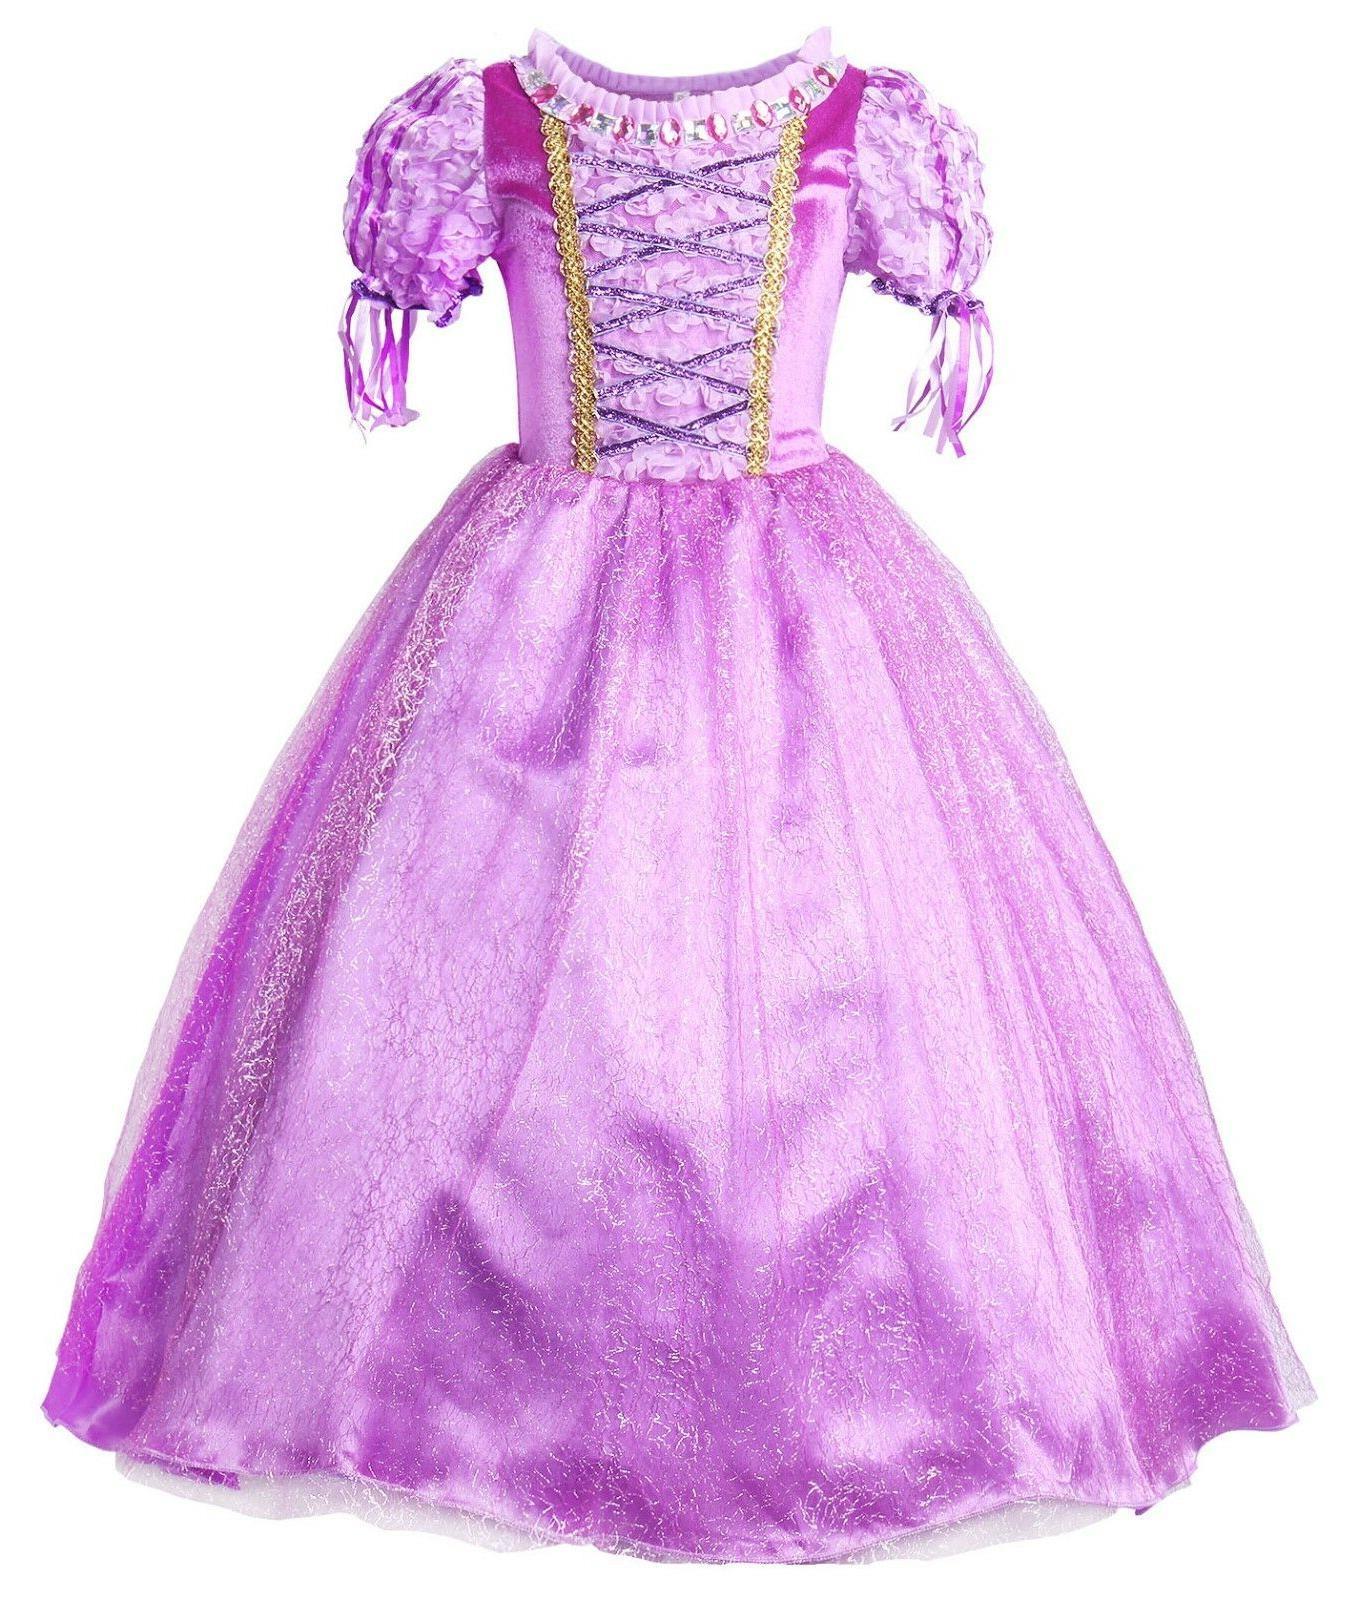 rapunzel dress girls princess costume party dress